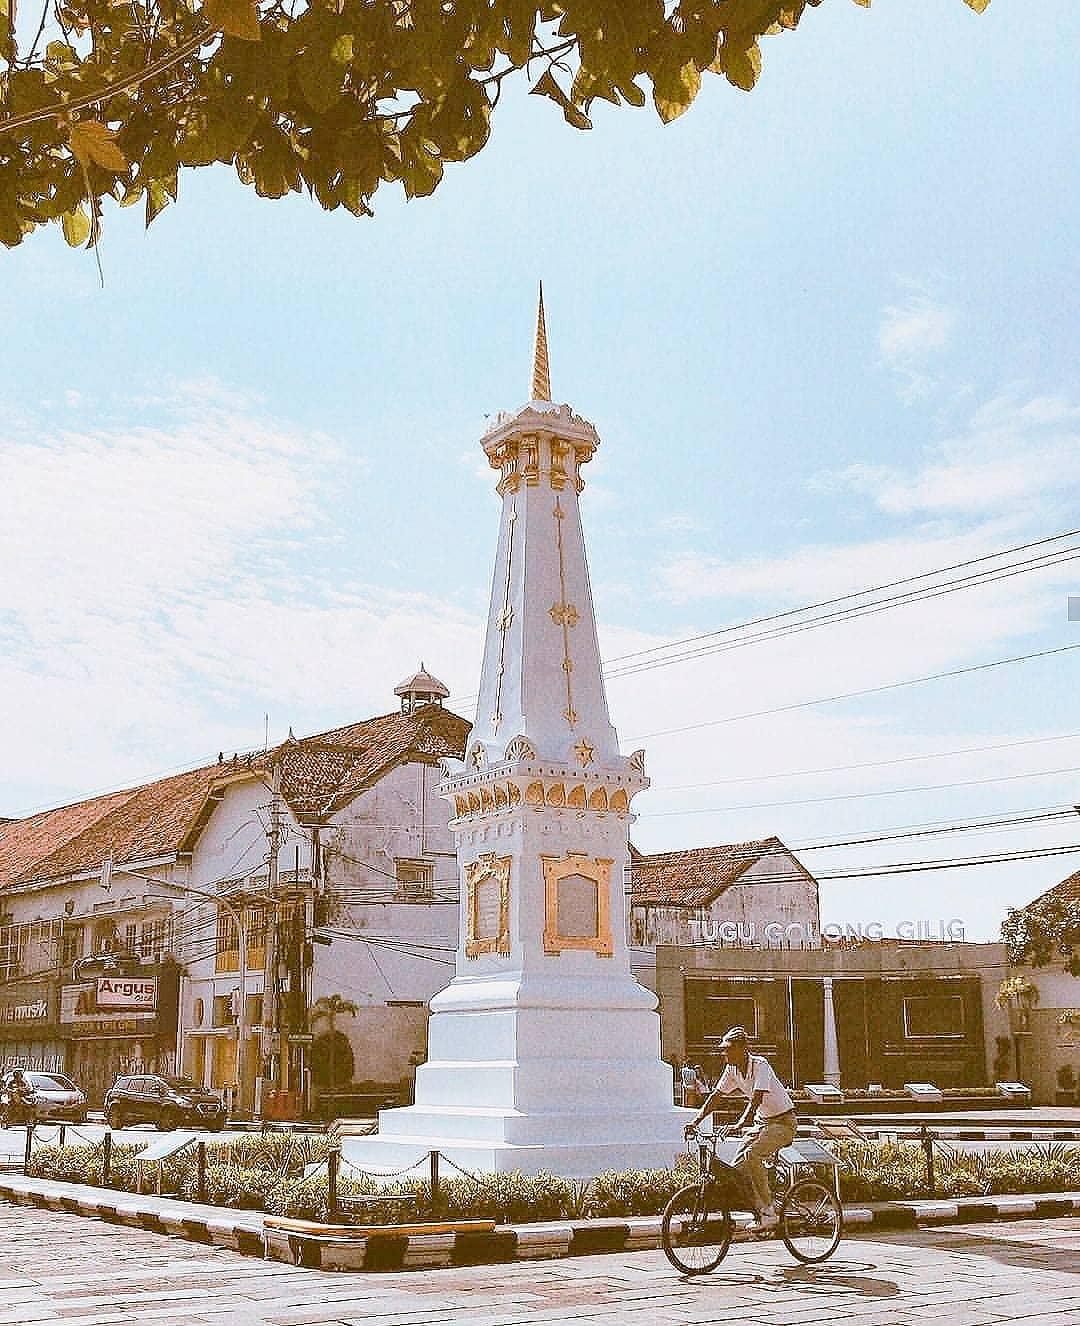 wisata dekat keraton jogja Jelajah Obyek Wisata Dekat Malioboro Jogja Wisata Hits